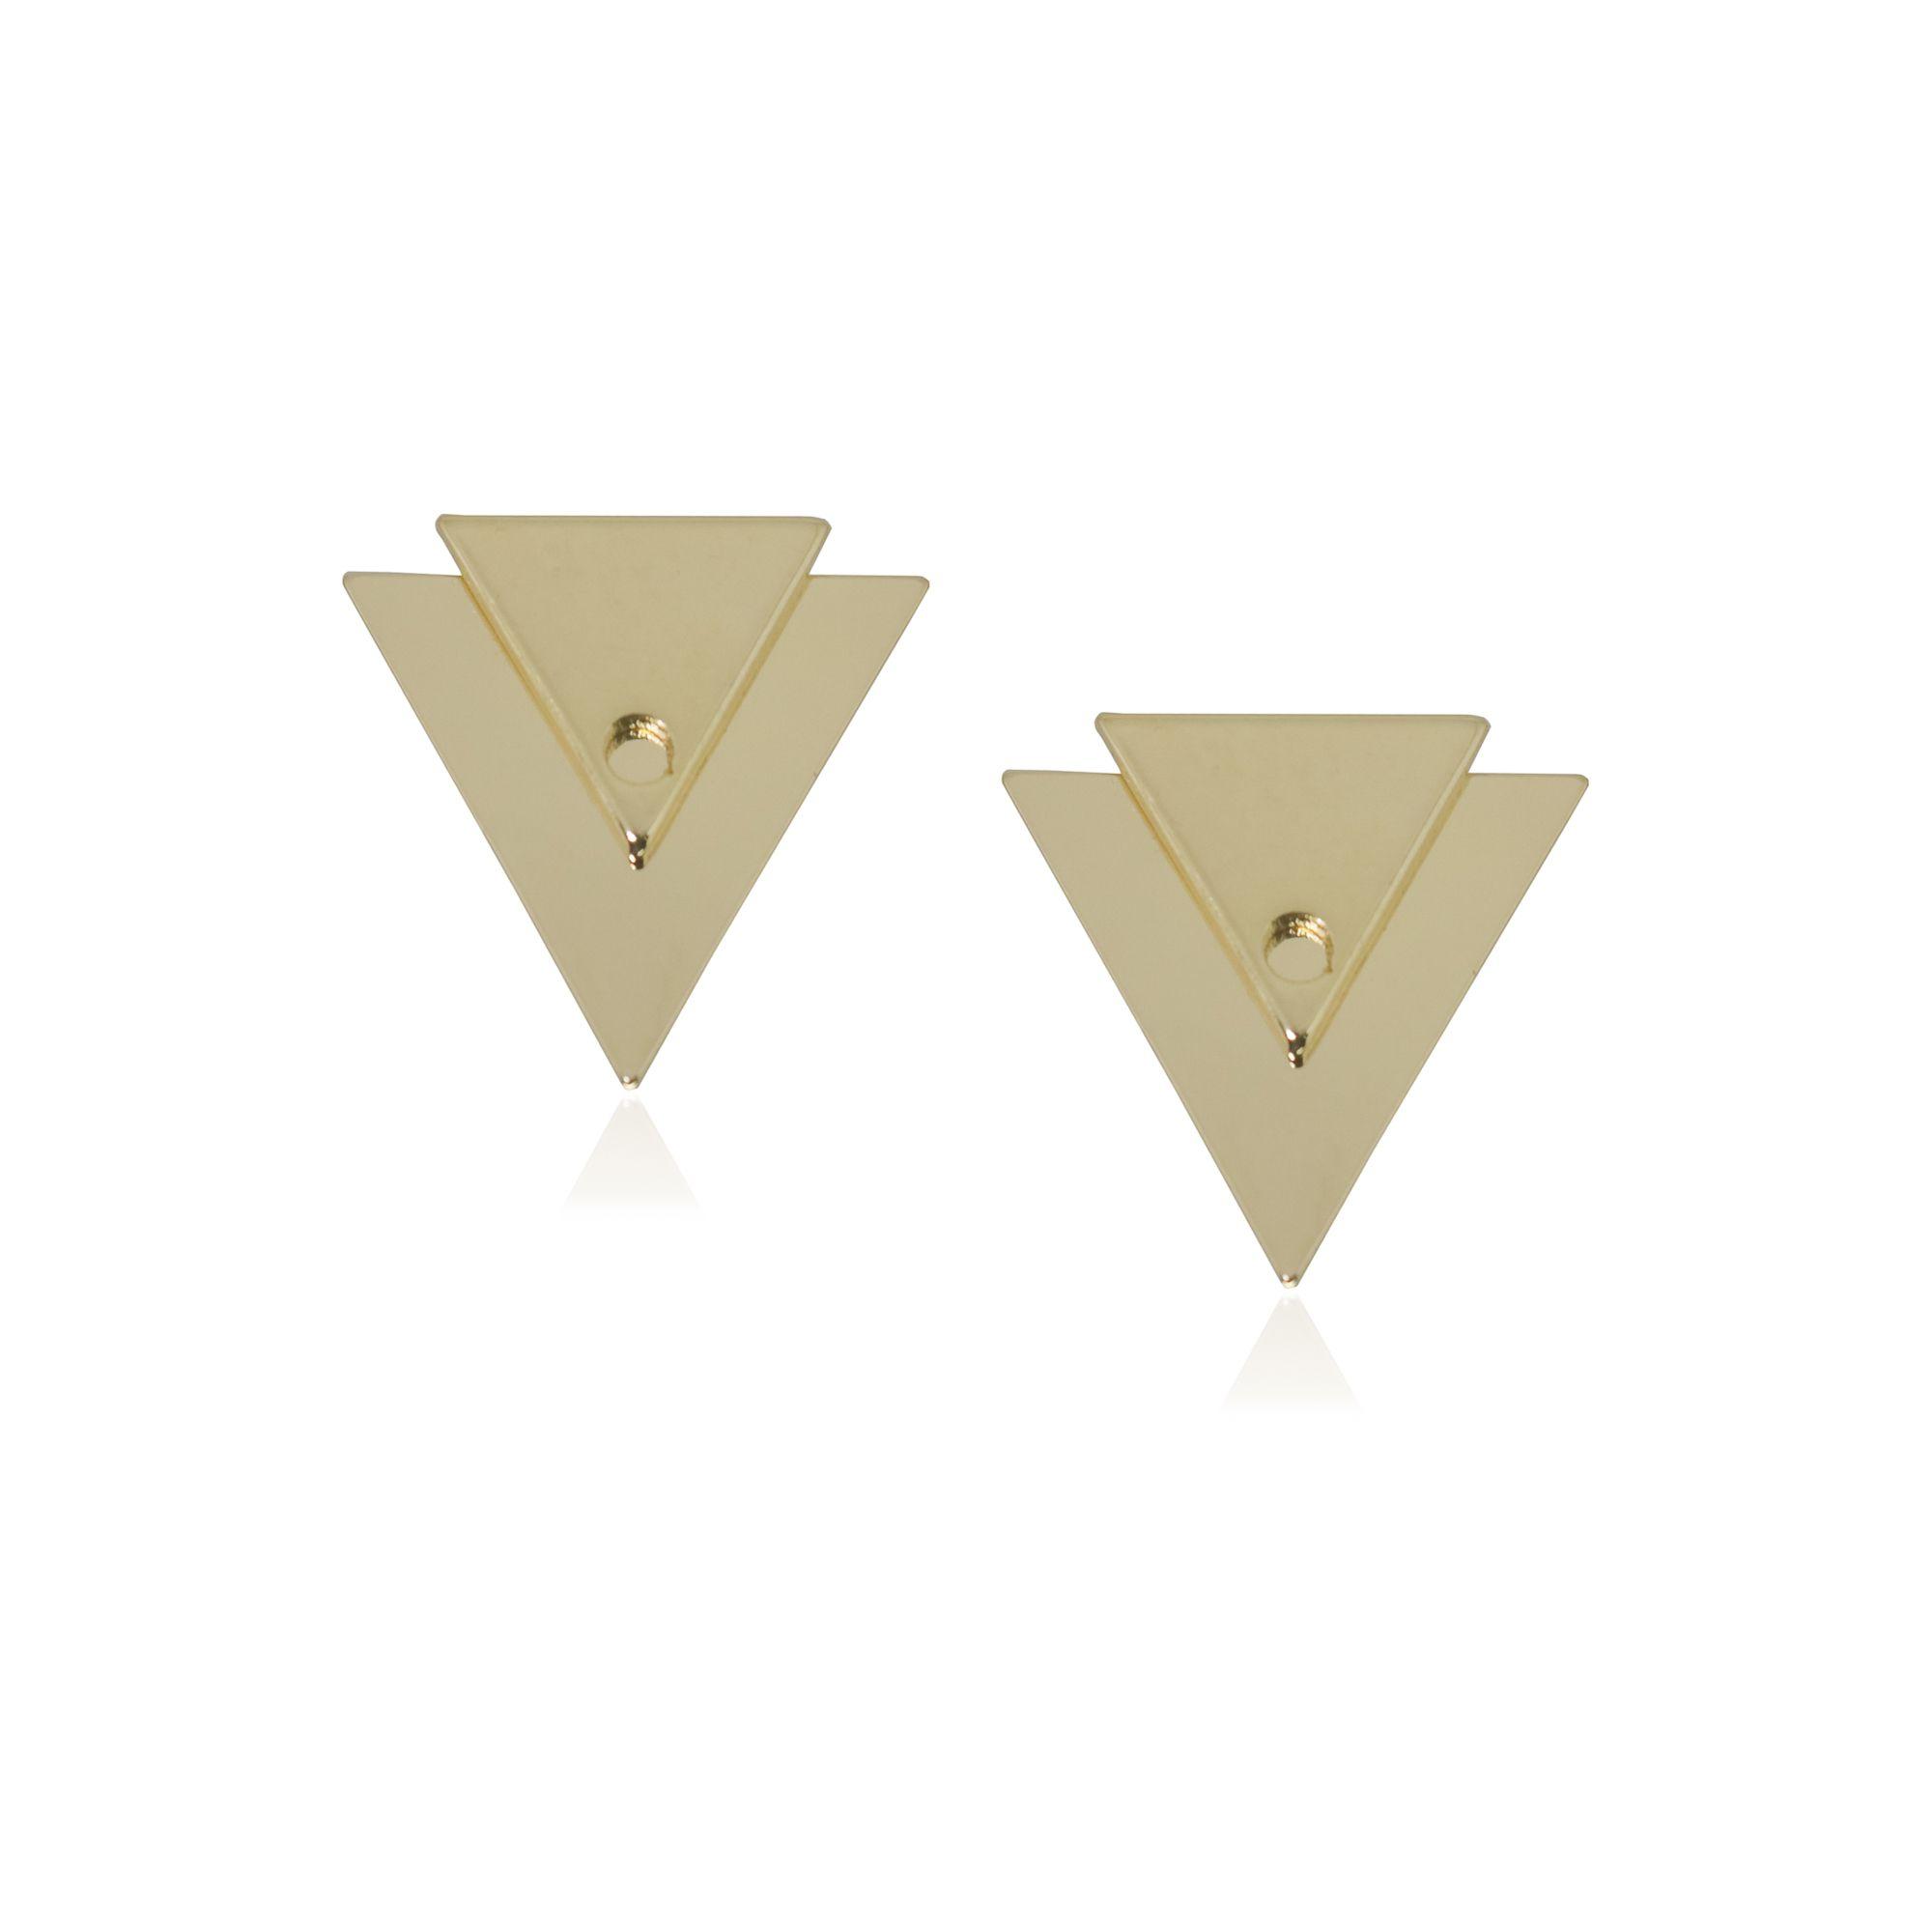 Brinco folheado semijoia geométrico Triângulo duplo